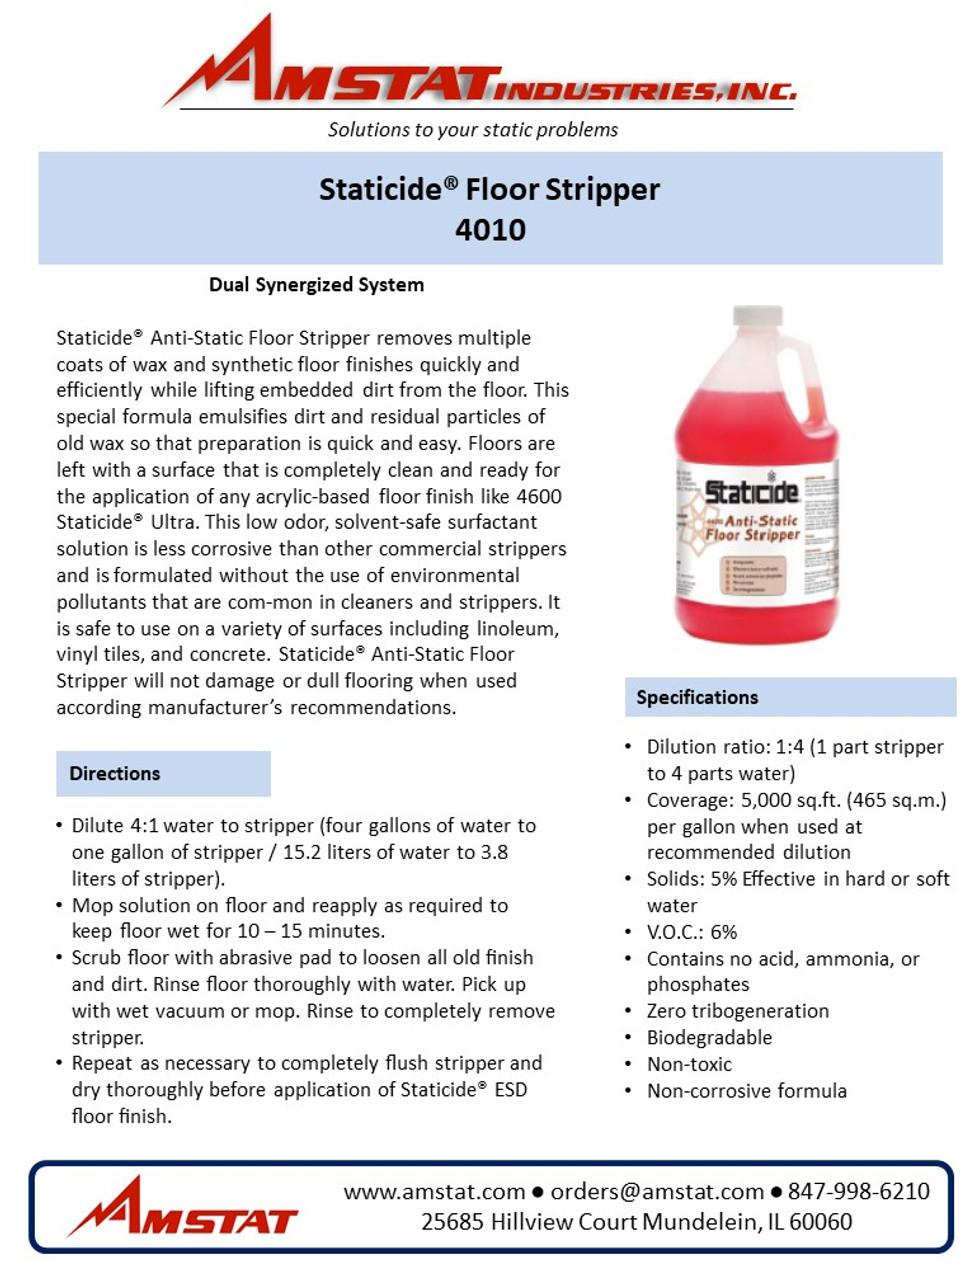 Staticide Floor Stripper Data Sheet